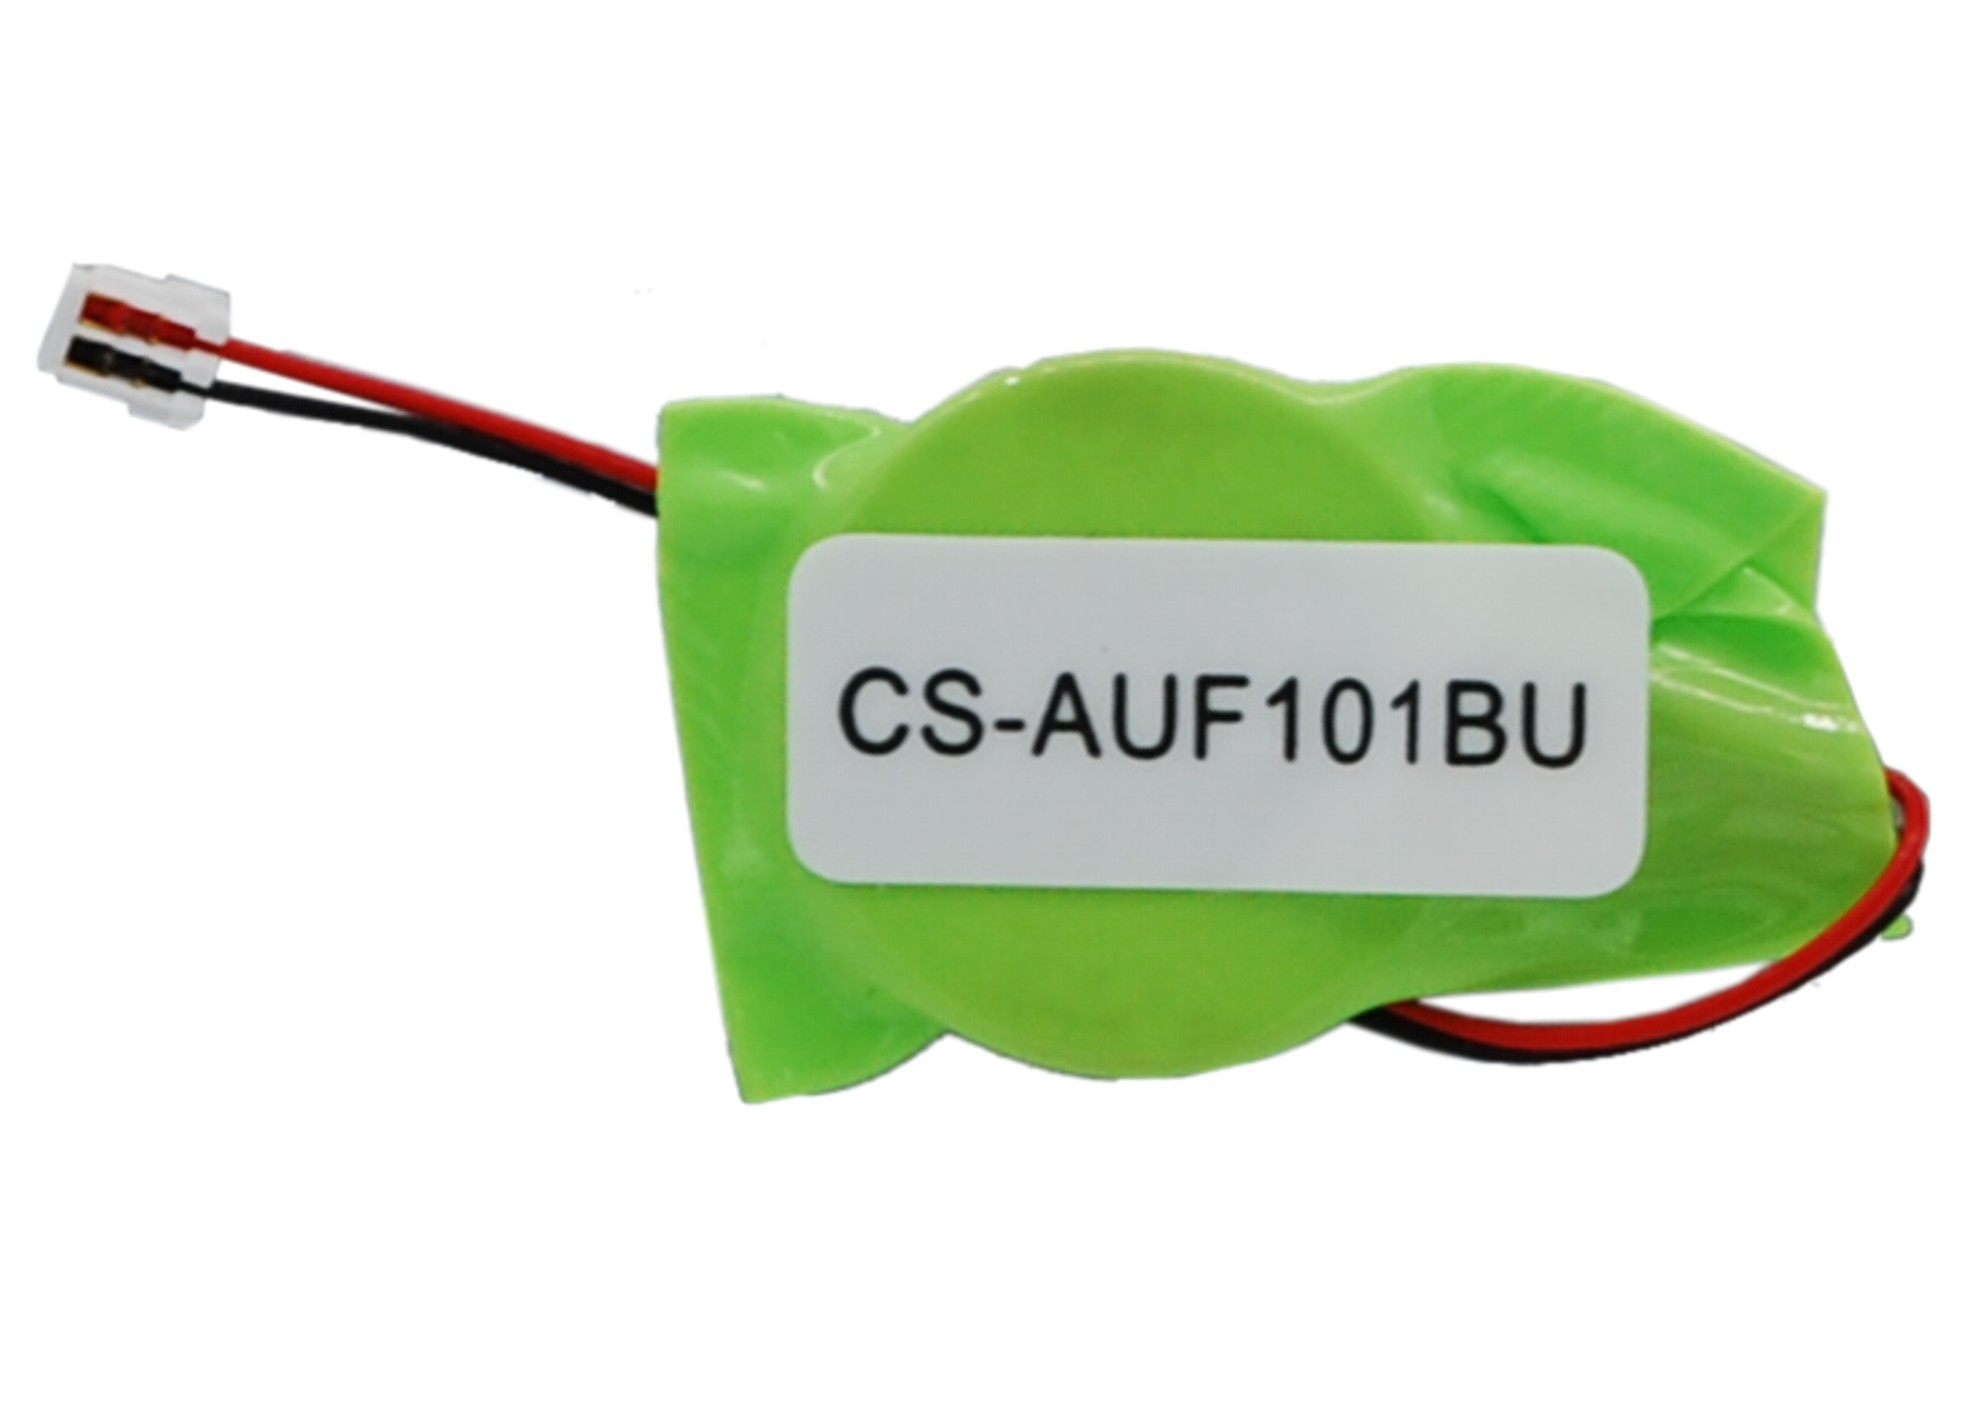 Cameron Sino baterie cmos pro ASUS Transformer Prime TF201-B1-GR 3V Li-ion 40mAh zelená - neoriginální